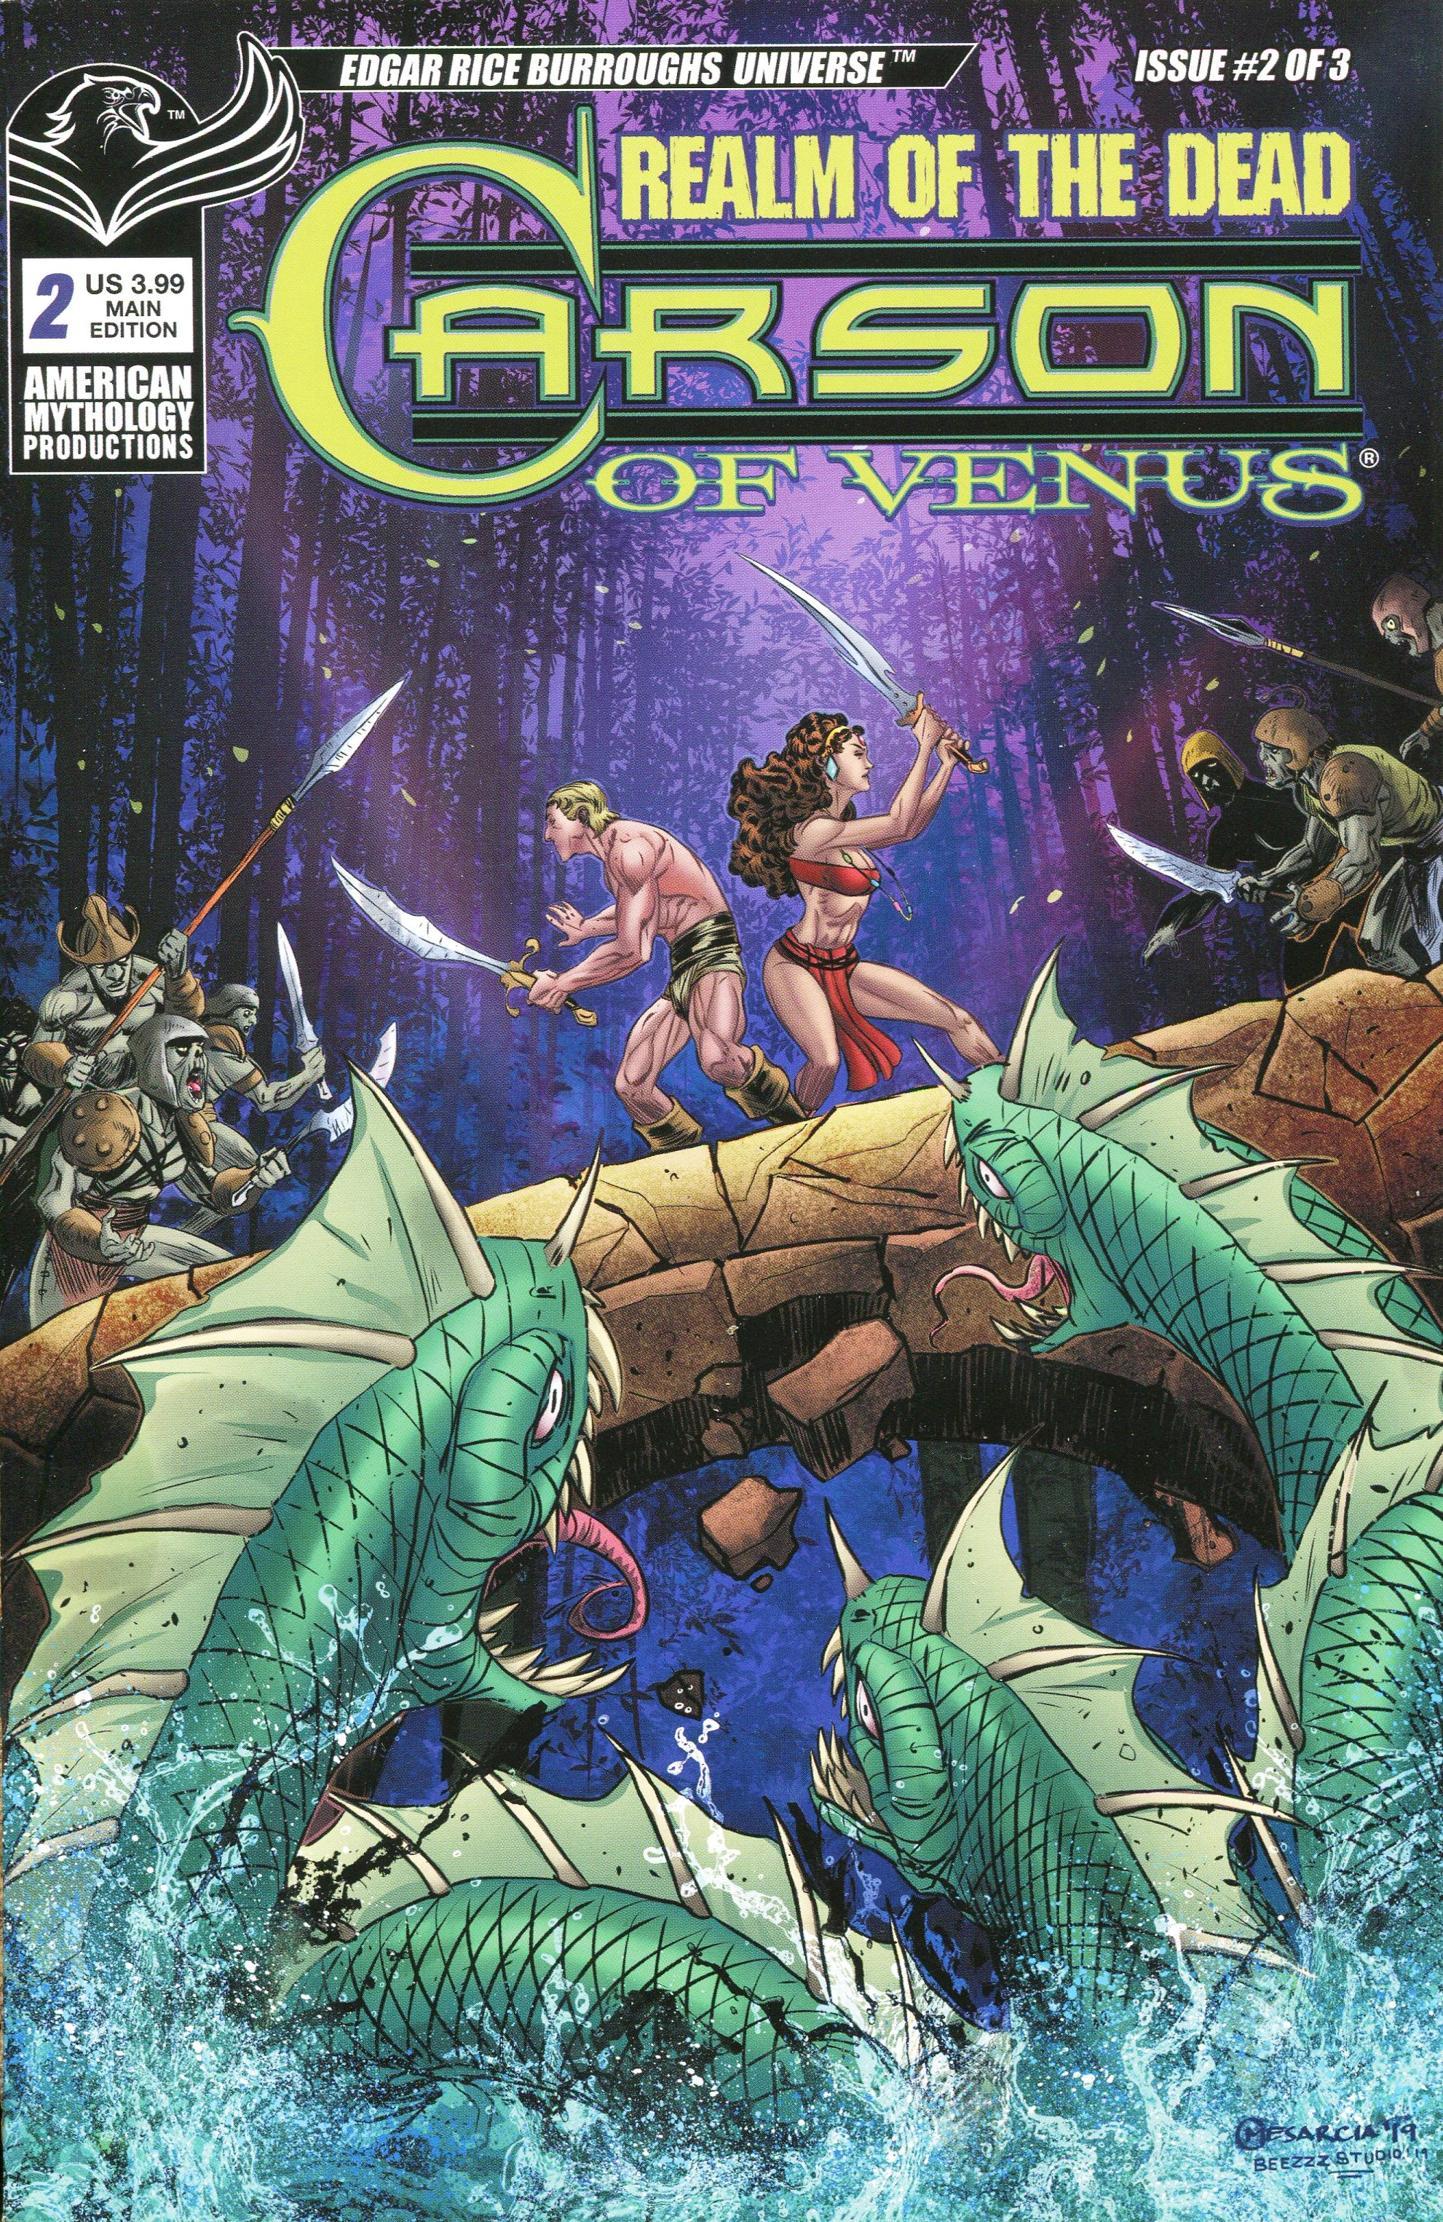 Carson of Venus-Realm of the Dead 002 2020 c2c American Mythology ComicsCastle